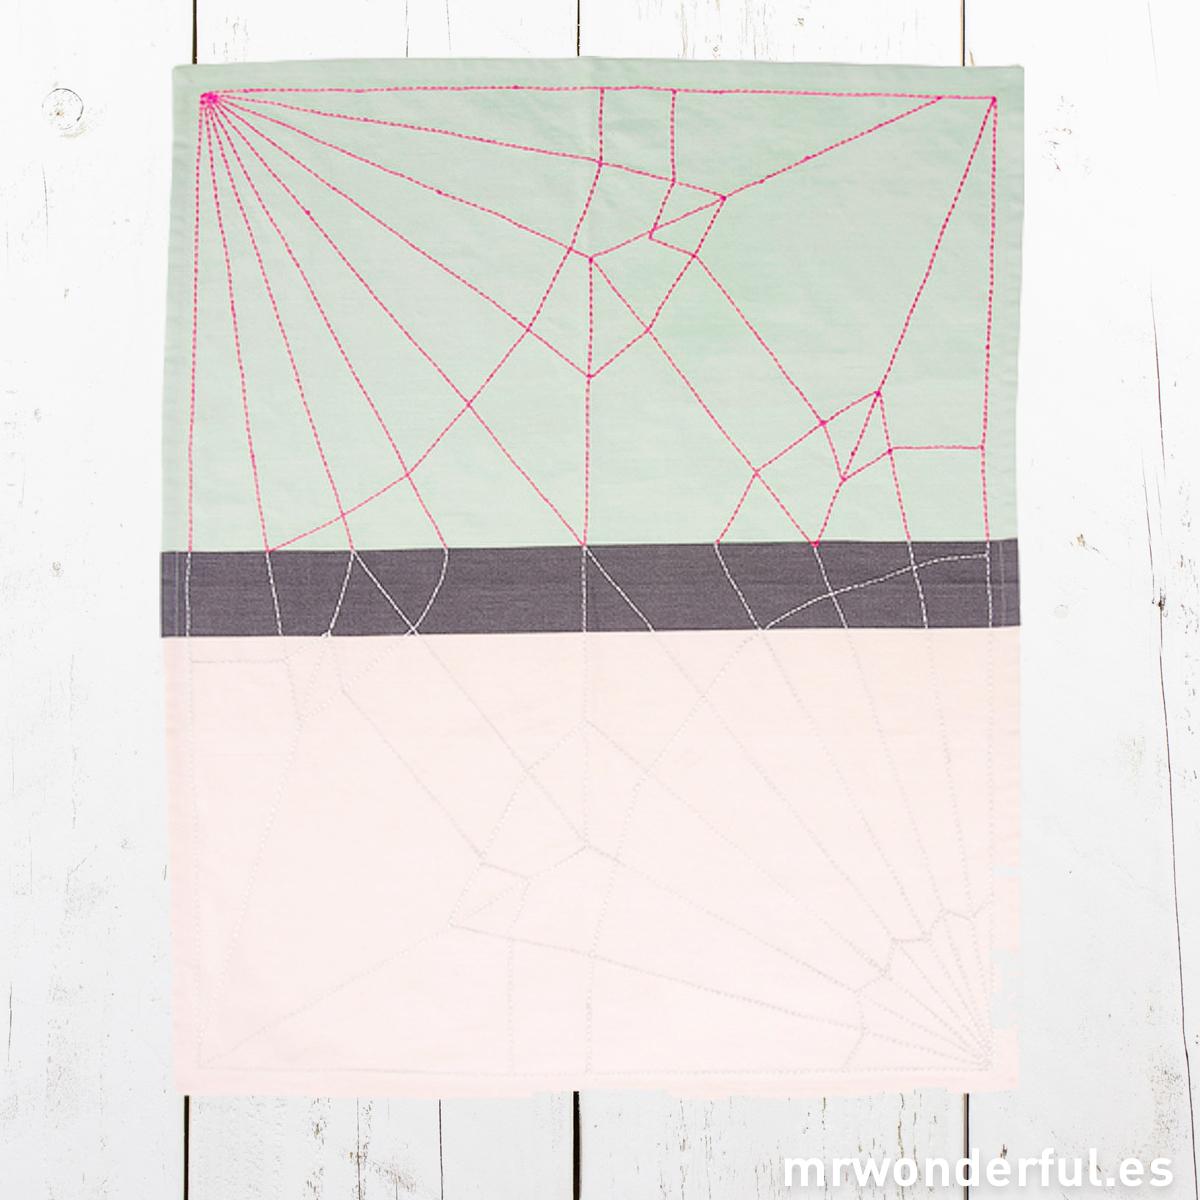 mrwonderful_PT2264_set-2-trapos-cocina-rosa-mint-1